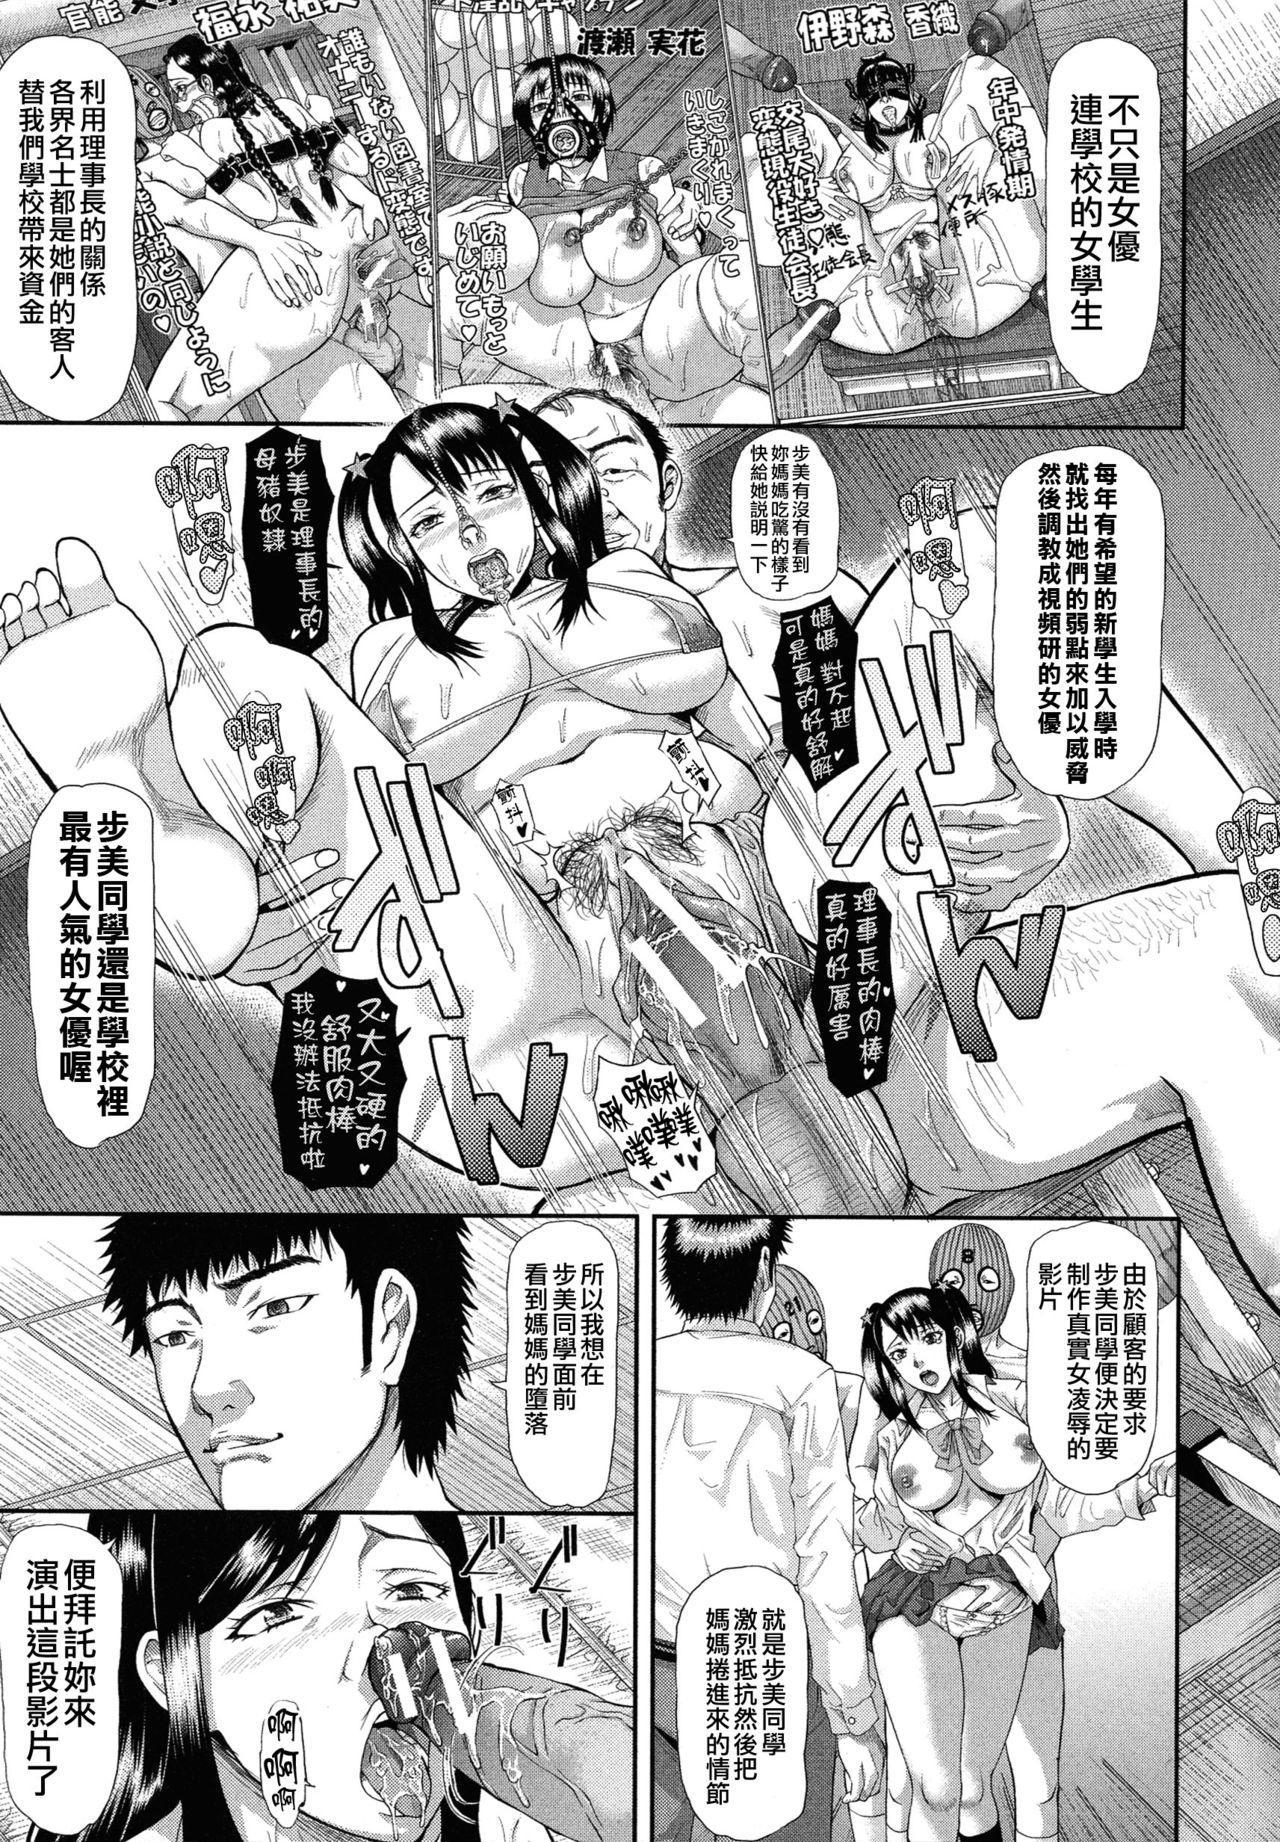 [Honebuto Danshaku] Innou Kaizou Program ~Oyako Zecchou Cult Ochi~ [Chinese]【不想记名重嵌--高质量图源】 147